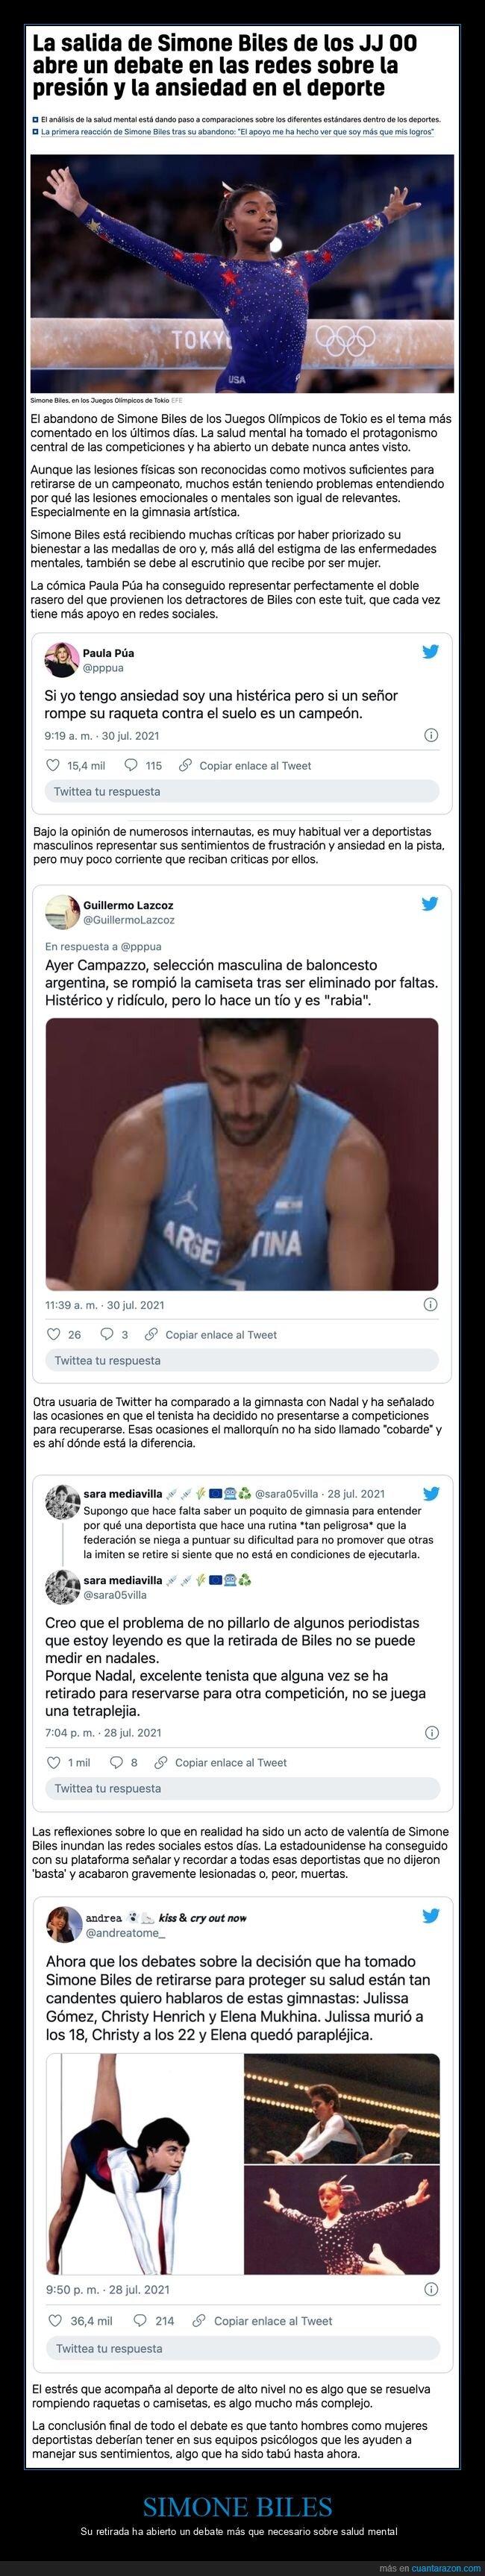 juegos olímpicos,retirada,salud mental,Simone Biles